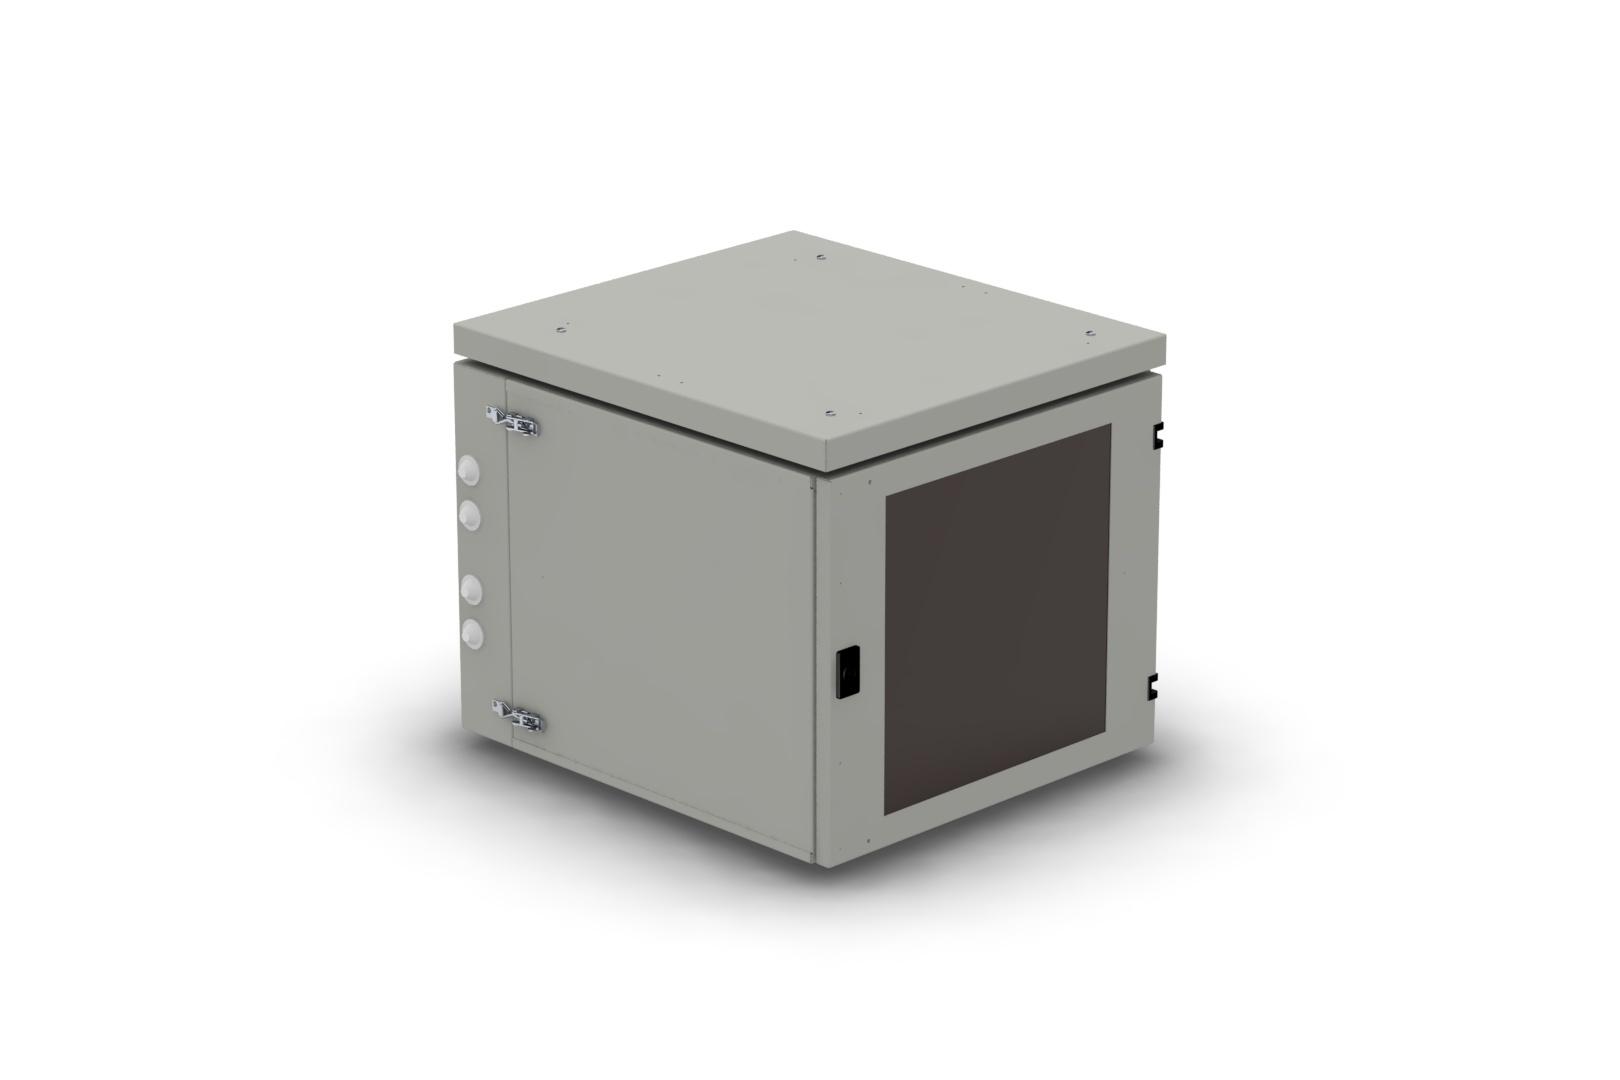 Телекоммуникационный шкаф WALLBOX IP55 plus 18-66 G серый NT WALLBOX IP55 plus 18-66 G